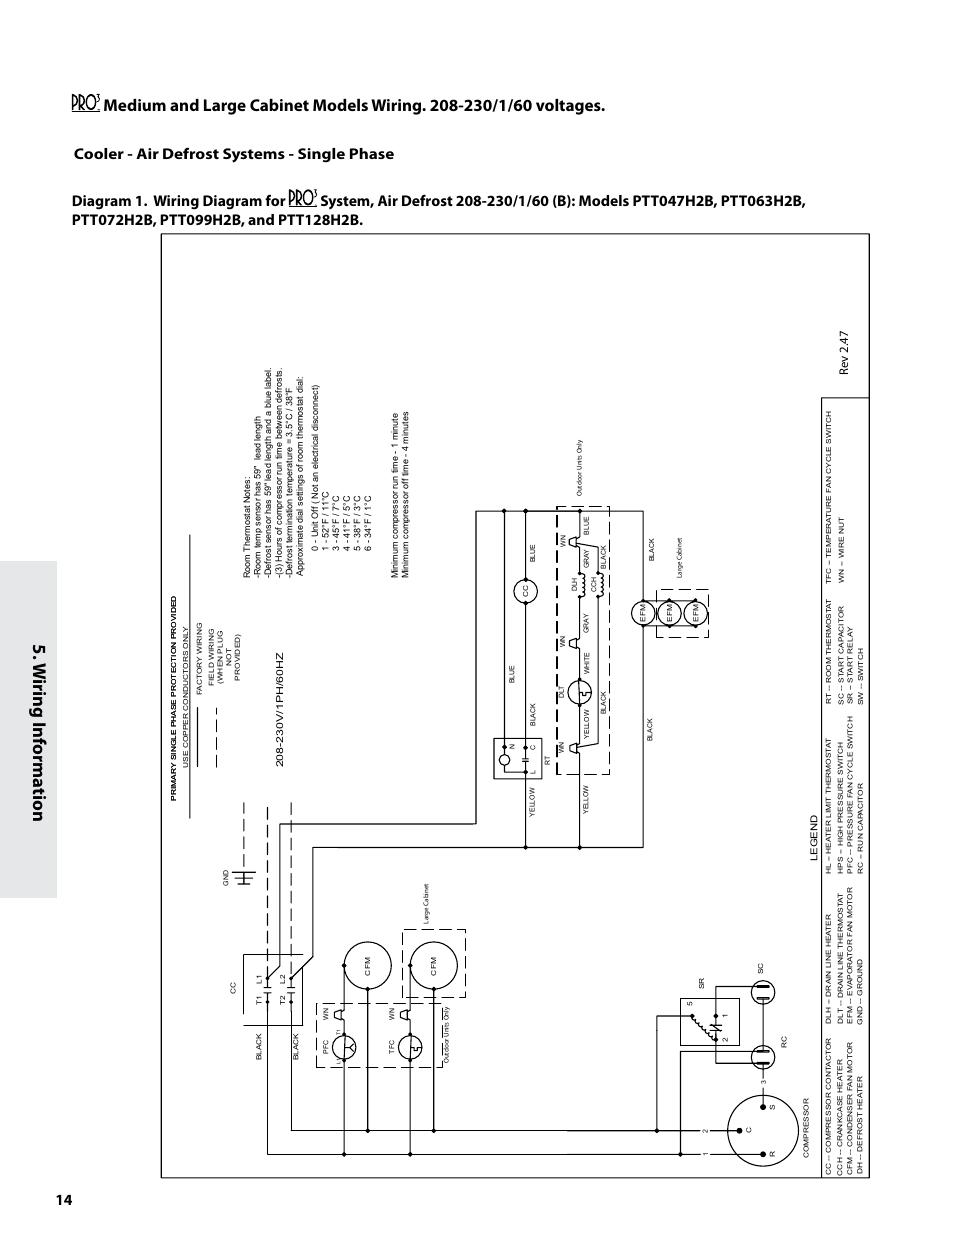 W Iring Inf Orma Tion Re V 2 47 Heatcraft Refrigeration Products Refrigerator Compressor Wiring Diagram 230v System H Im 82b User Manual Page 14 20